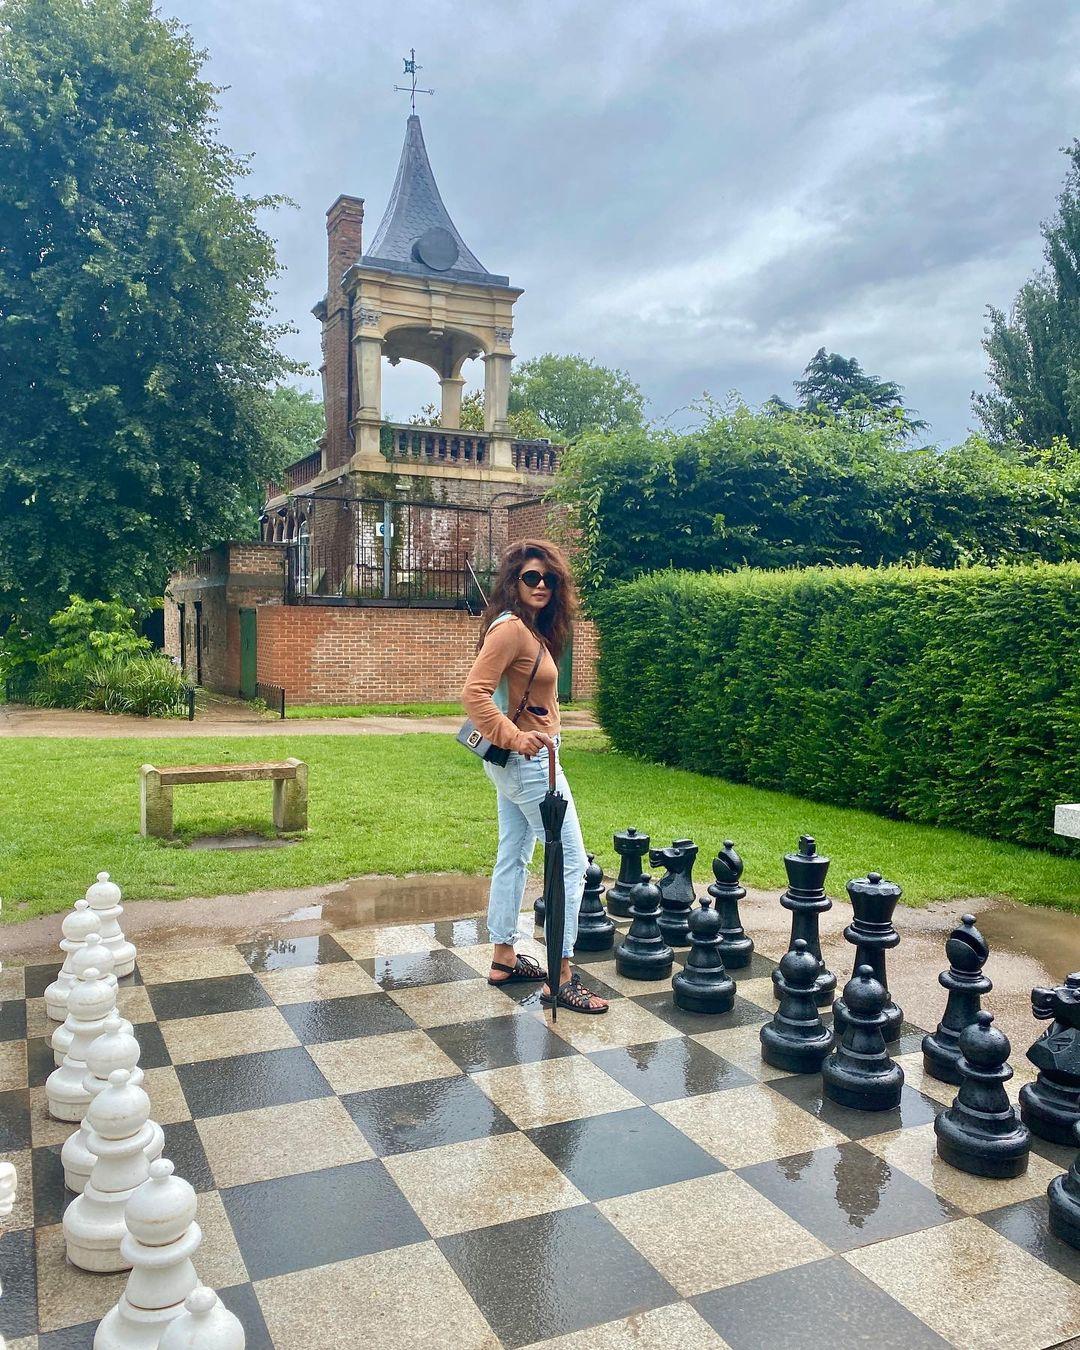 Priyanka Chopra Post some pic from London